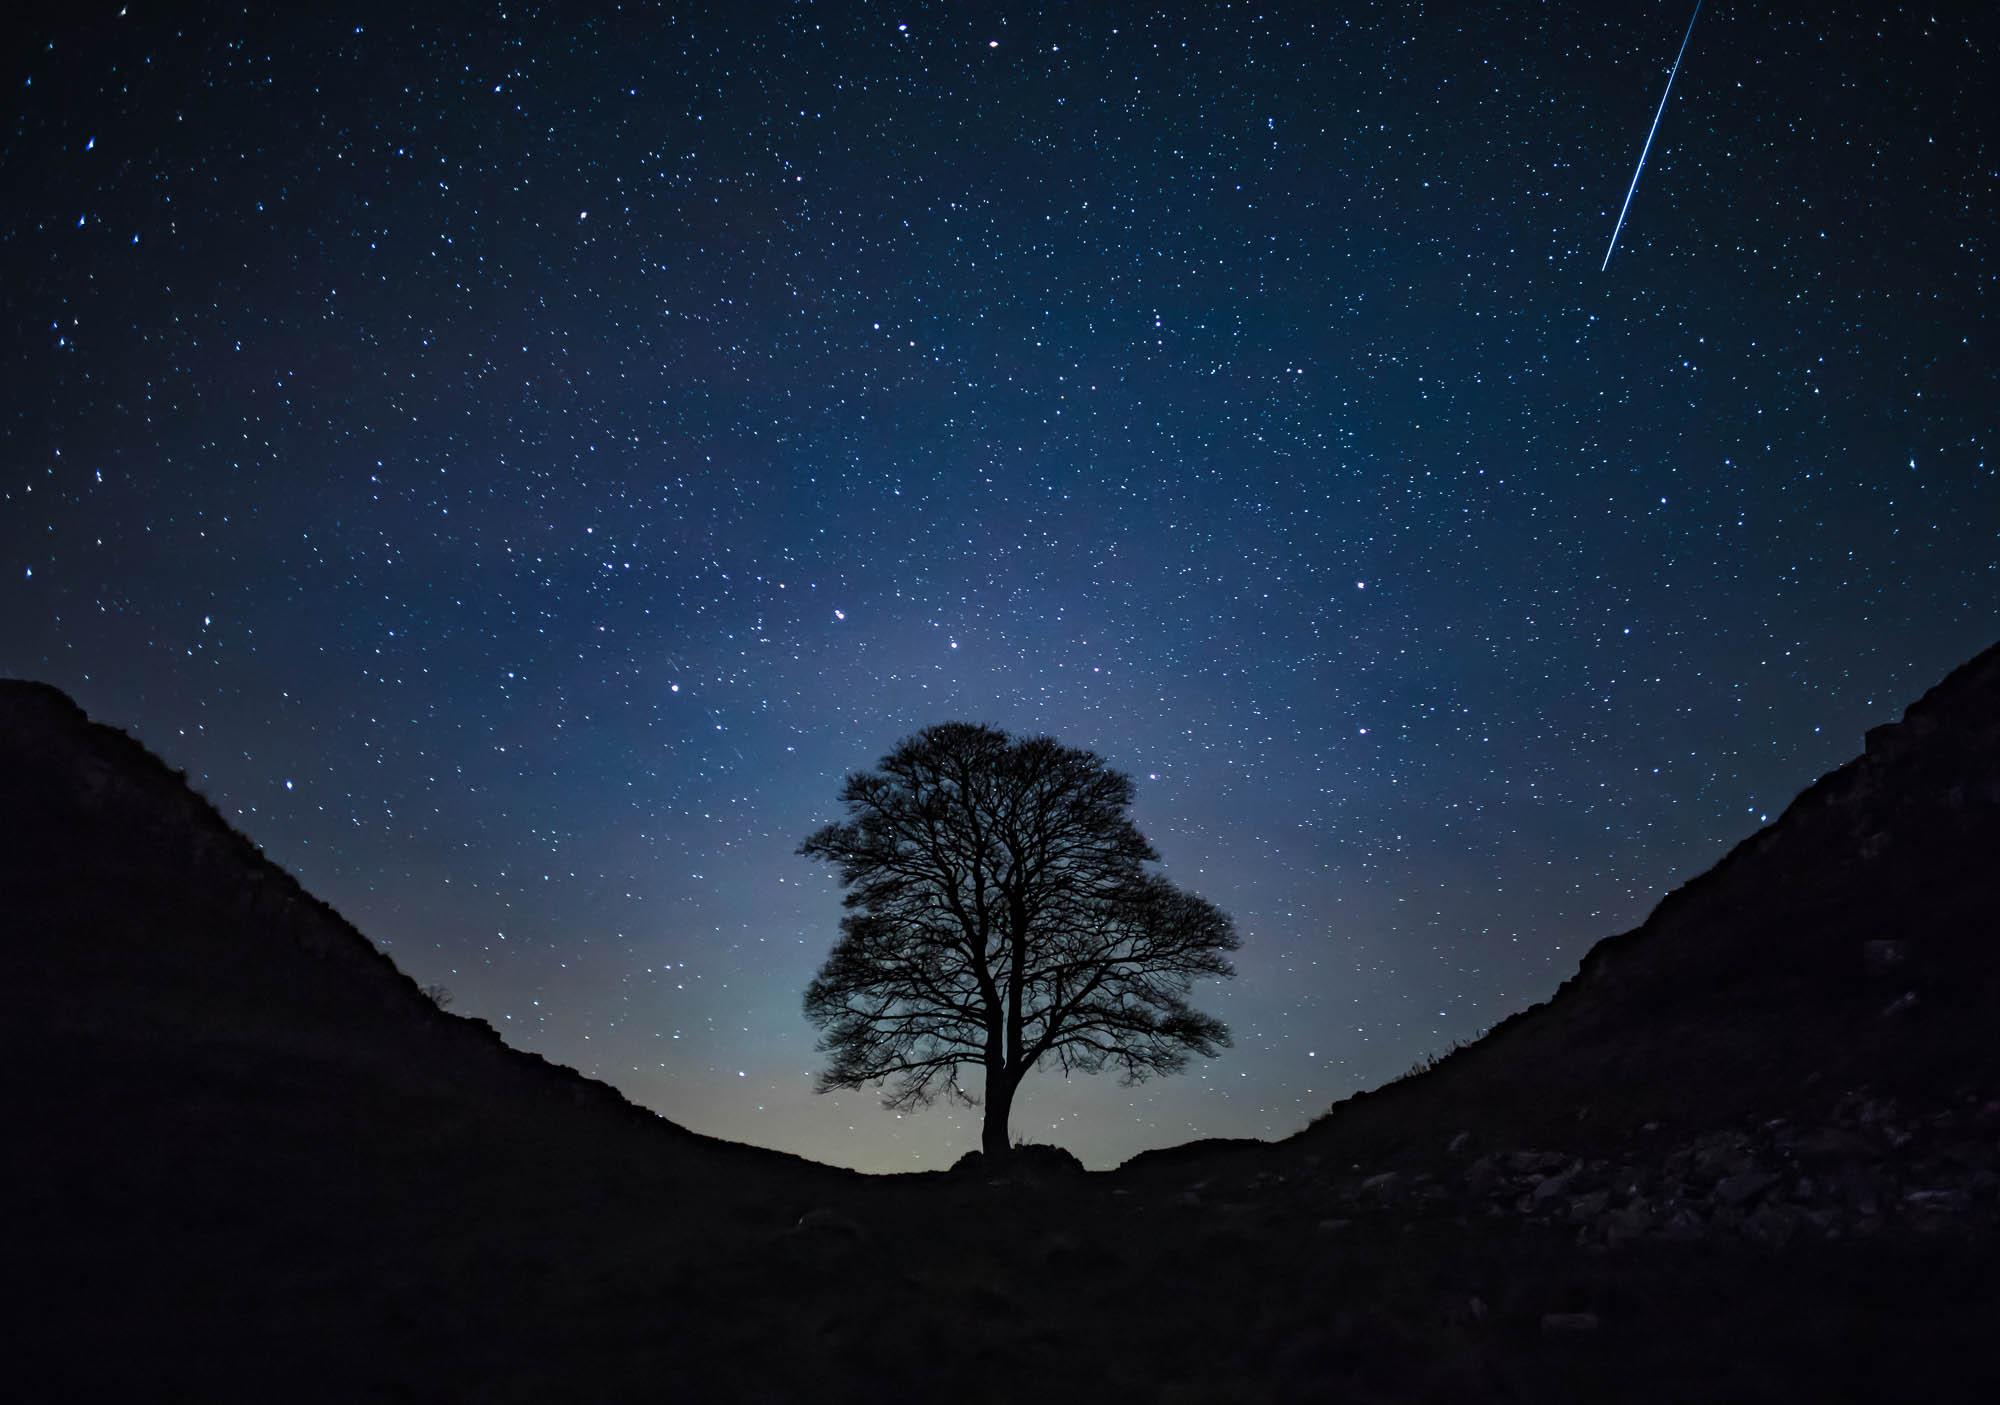 A shooting star over Sycamore Gap, Hadrian's Wall, Northumberland, England